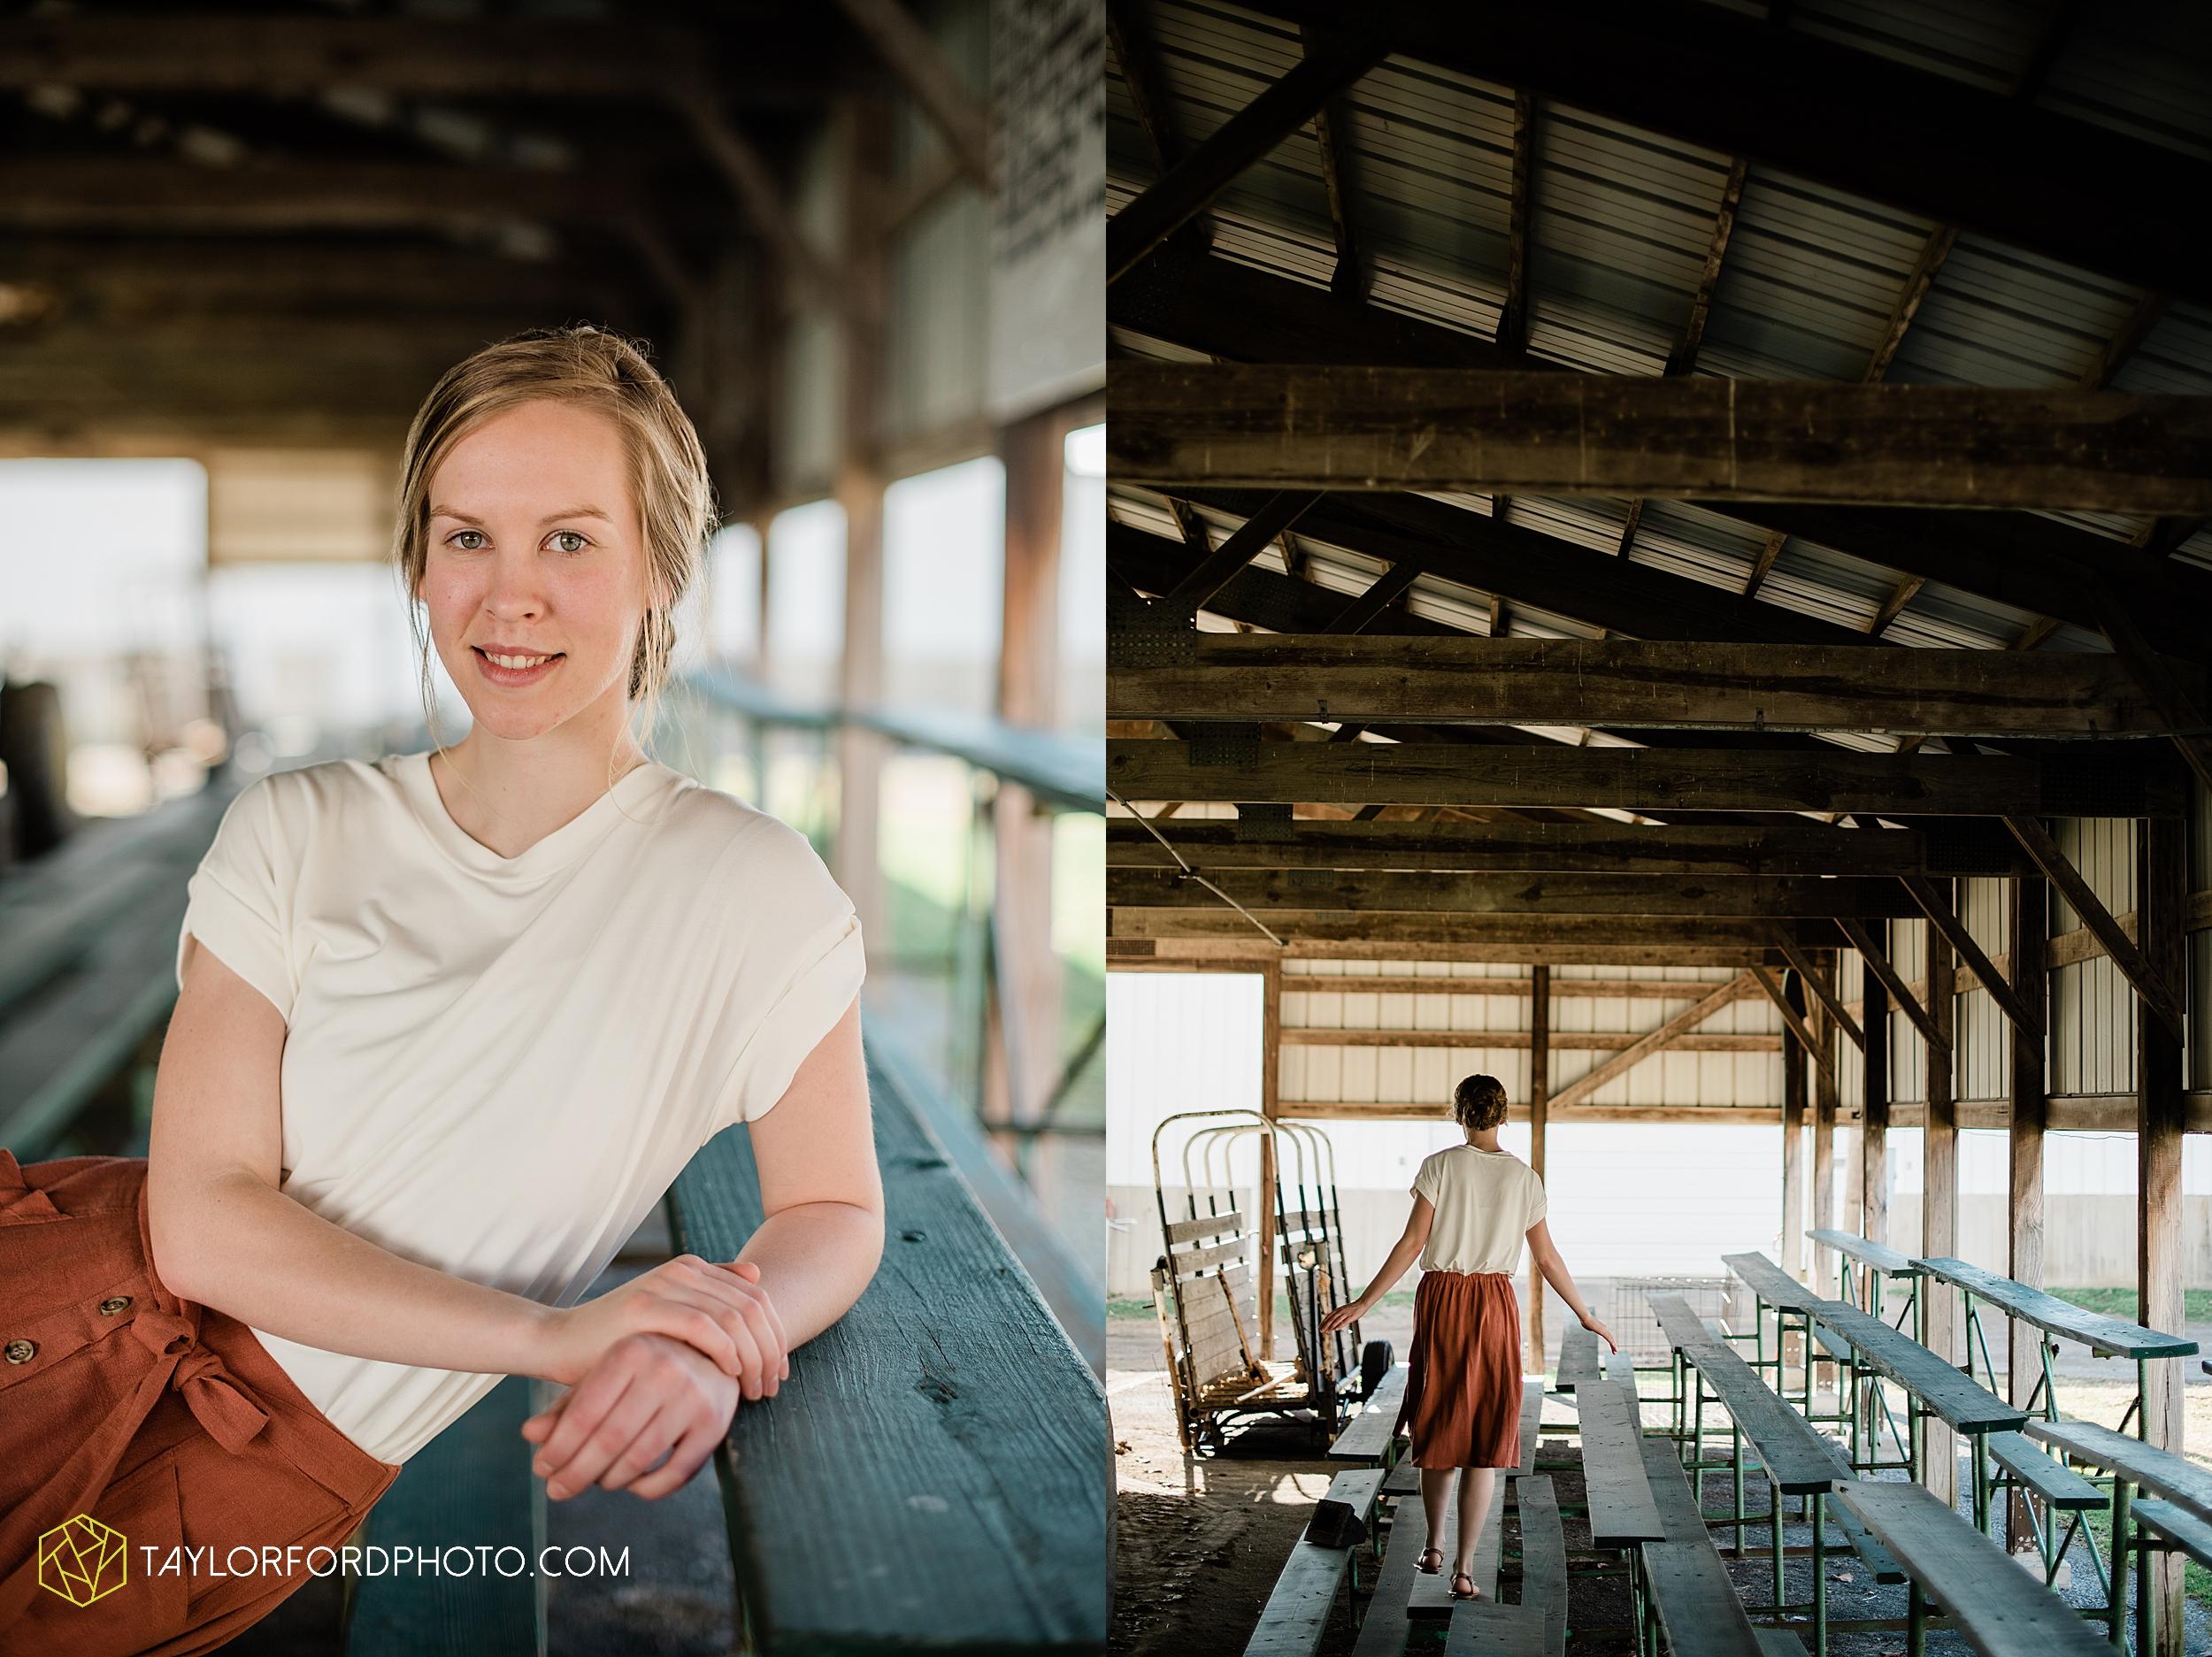 adrienne-van-wert-ohio-senior-downtown-county-fairgrounds-country-fort-wayne-indiana-high-school-photographer-photography-taylor-ford-hirschy-photographer_2532.jpg